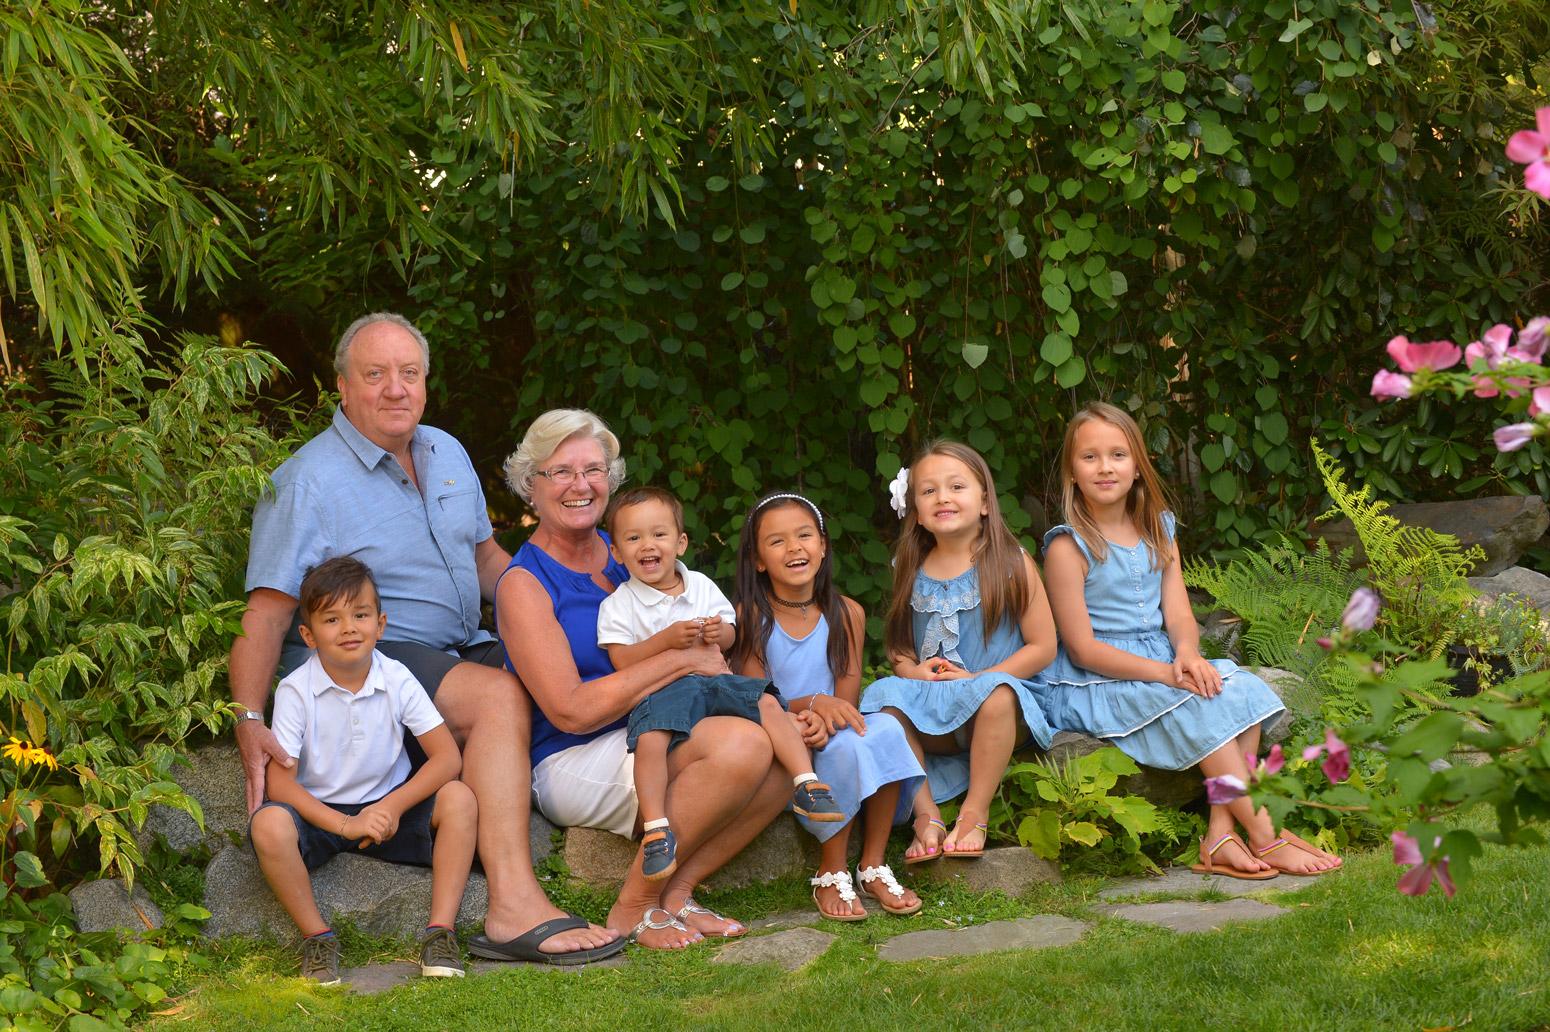 grandparents-and-grandchildren-portrait